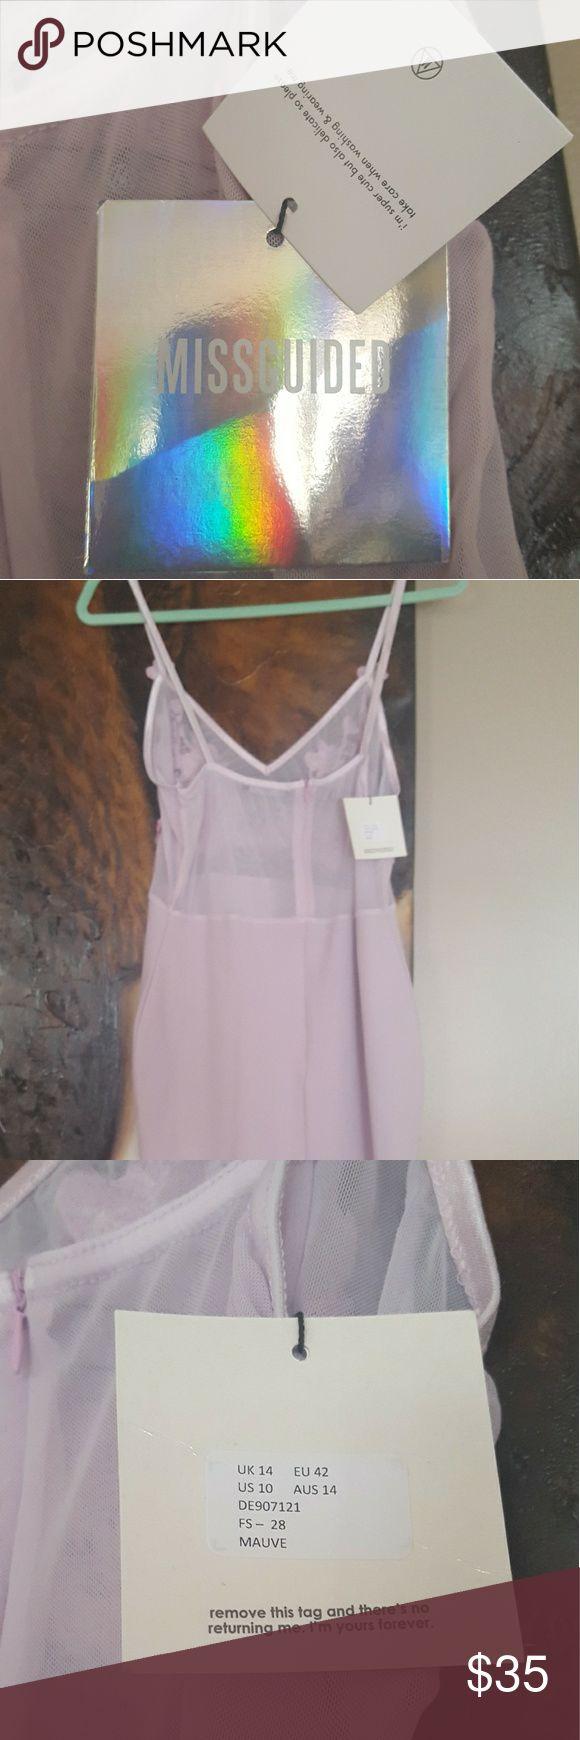 NWT Lilac Mesh Missguided Dress Spaghetti strap midi dress from Missguided. Beautiful lilac size 10 US/14 UK. Never worn Missguided Dresses Midi